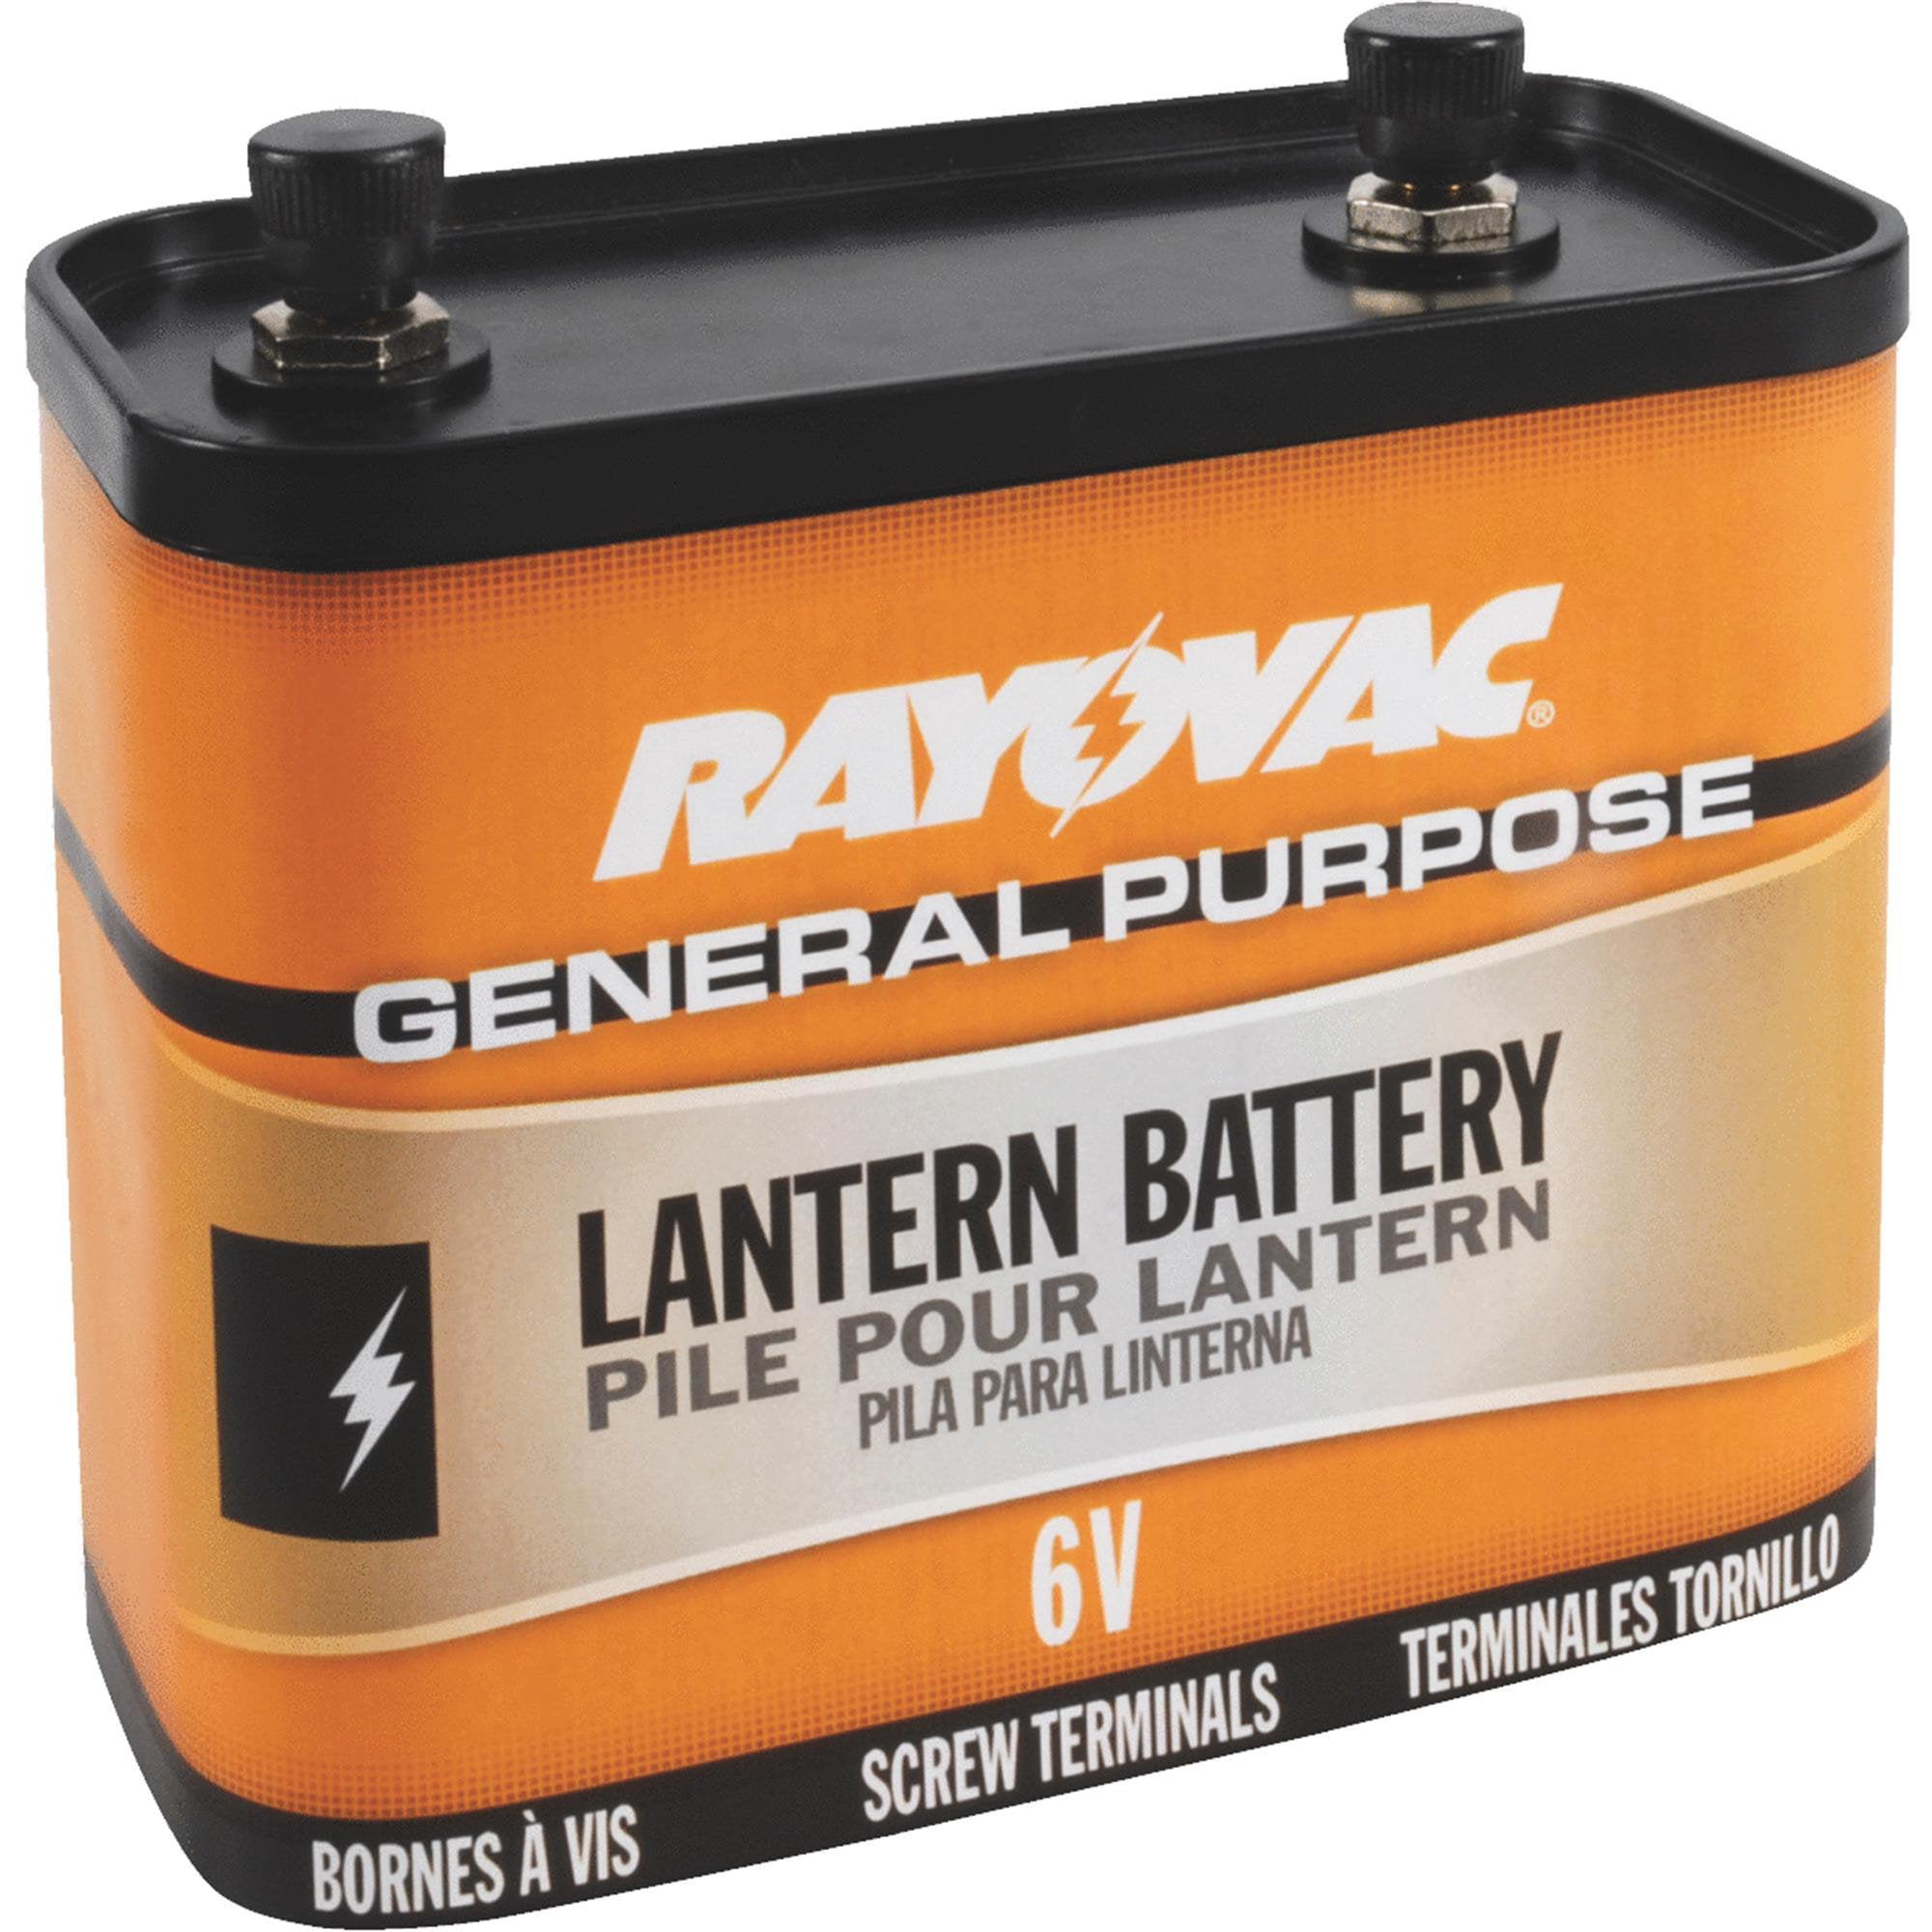 Rayovac General Purpose 6V Screw Terminal Zinc Lantern Battery